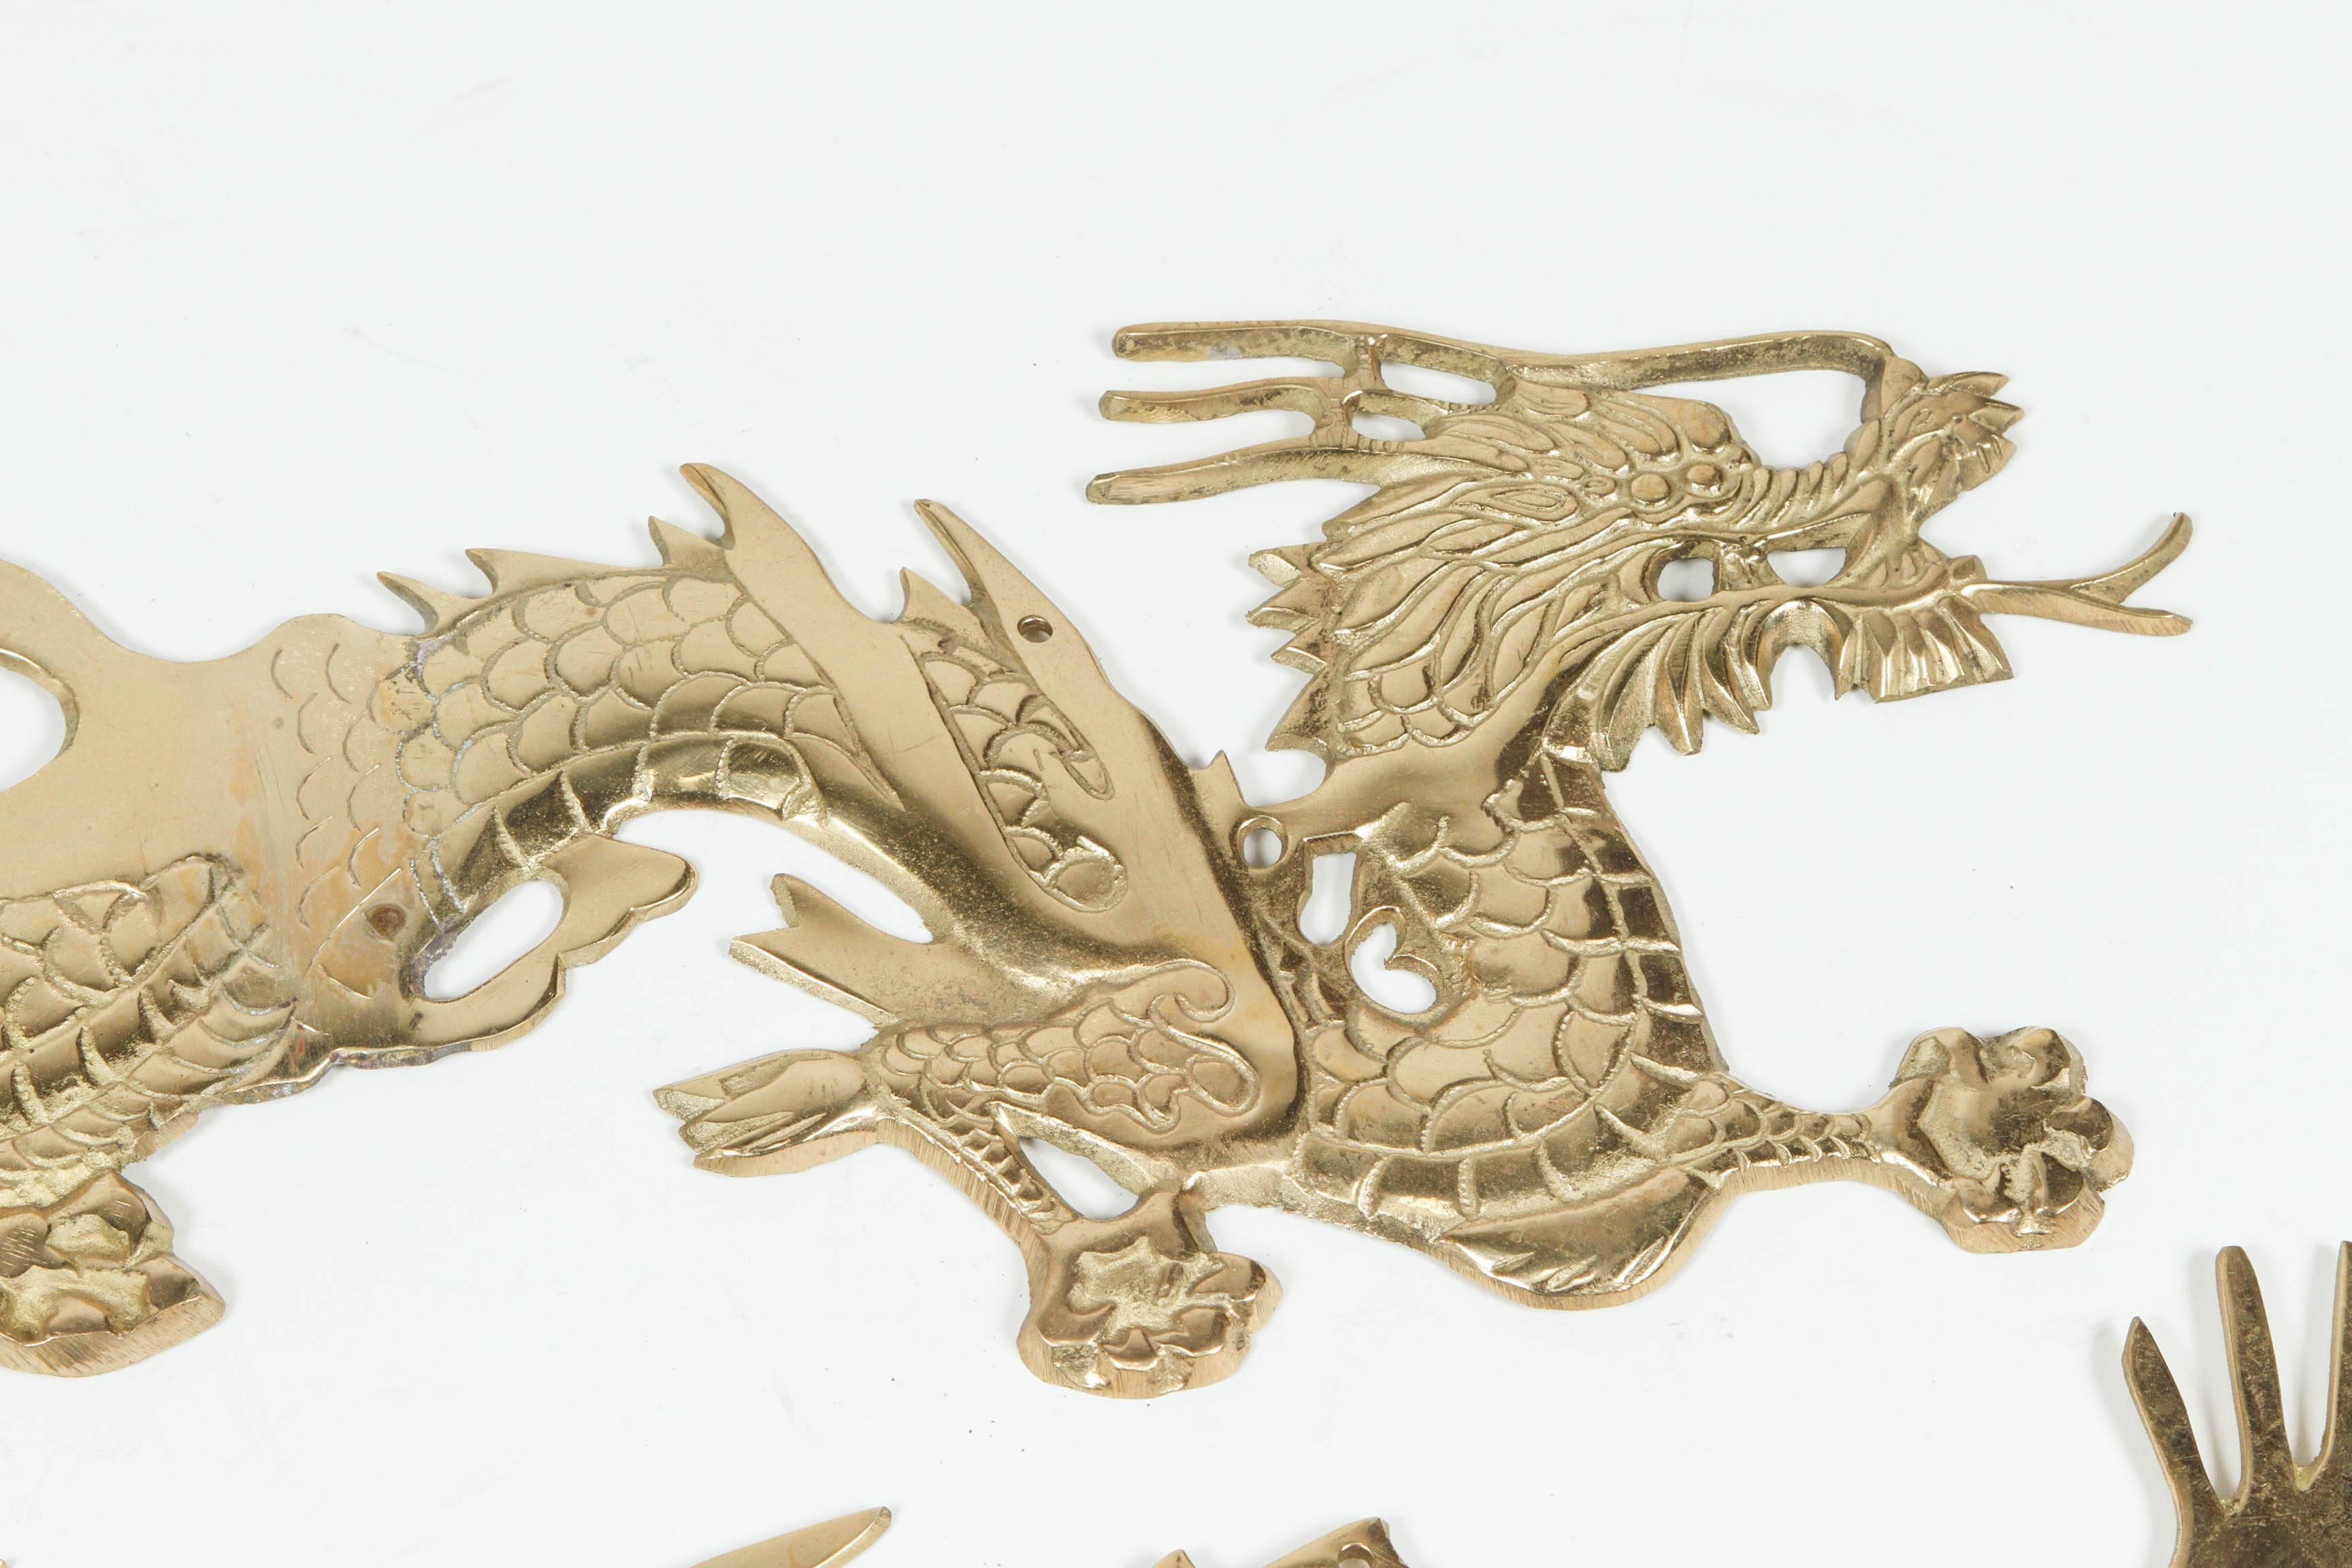 Enchanting Dragon Head Wall Decor Motif - The Wall Art Decorations ...